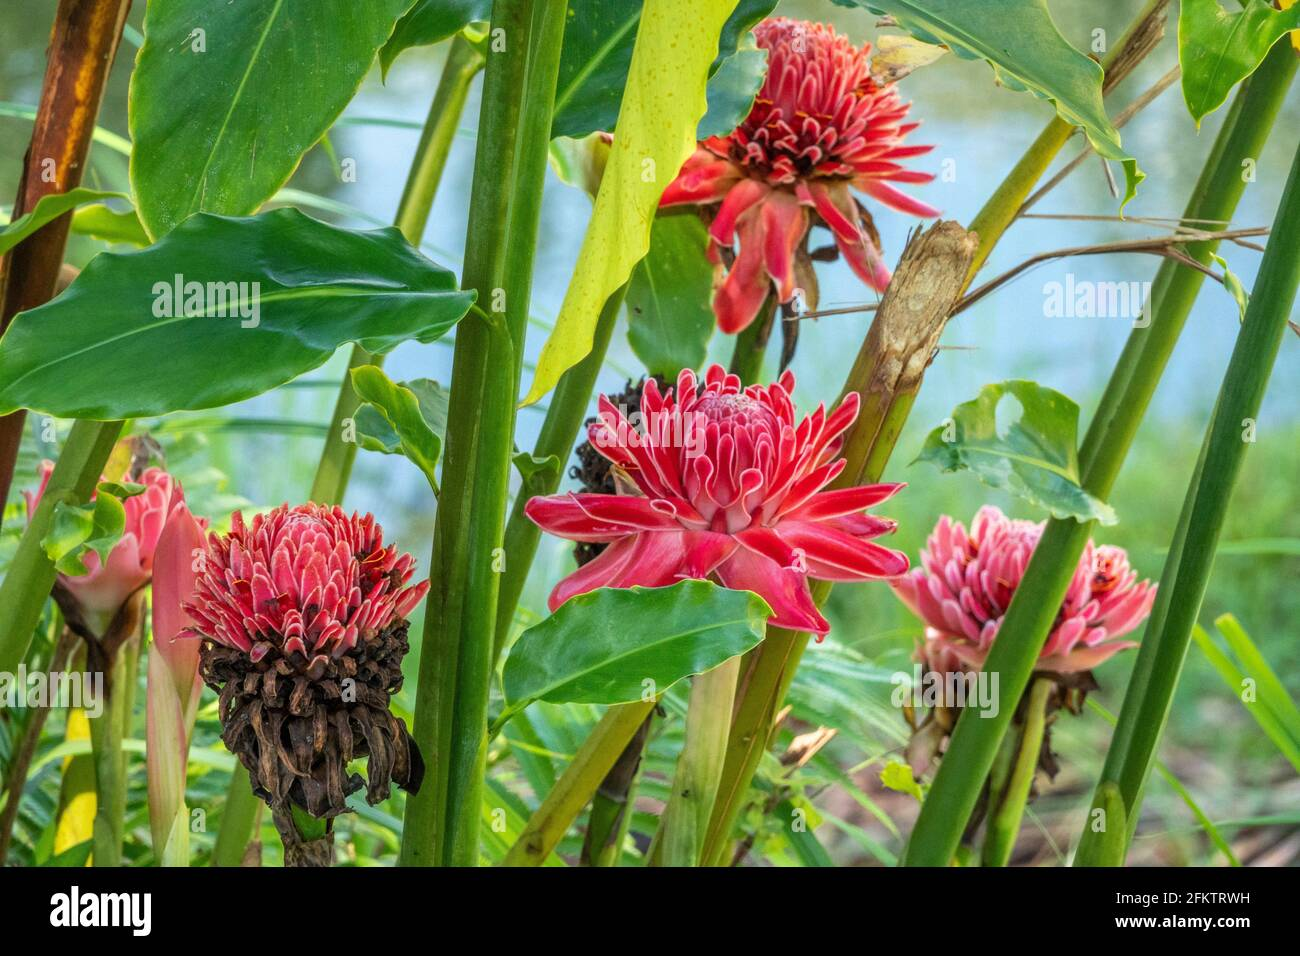 Fleur de gingembre rouge (Etlingera elatior), Abba Paradise, Taiton, Bau, Sarawak, Malaisie orientale Banque D'Images